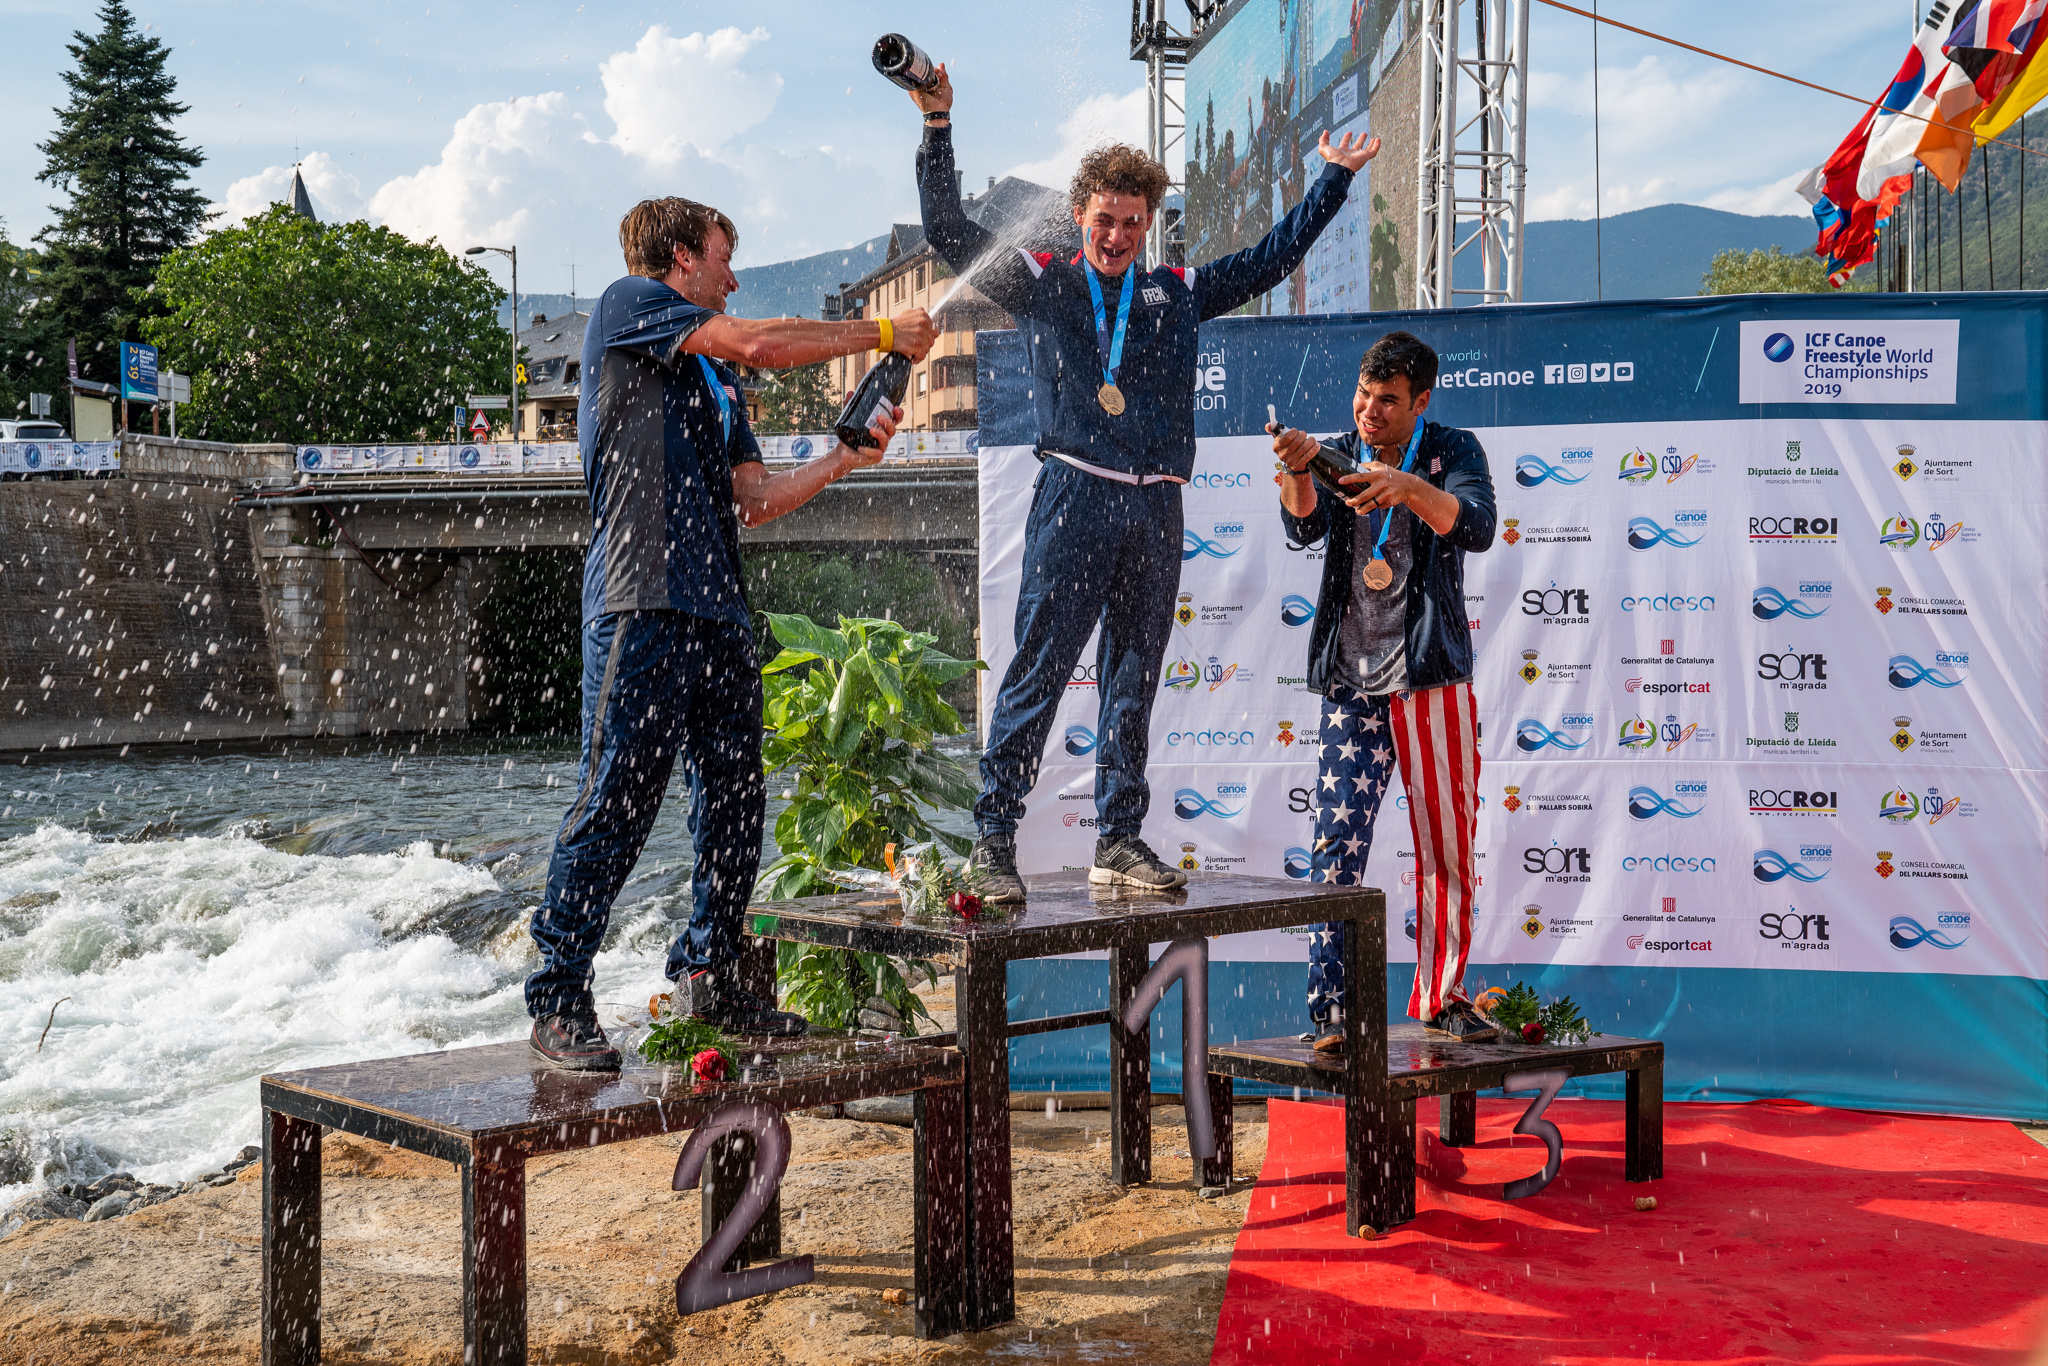 World Champion Tom Dolle (France), 2nd Place Dane Jackson (USA) and 3rd Jorden Poffenberger (USA)